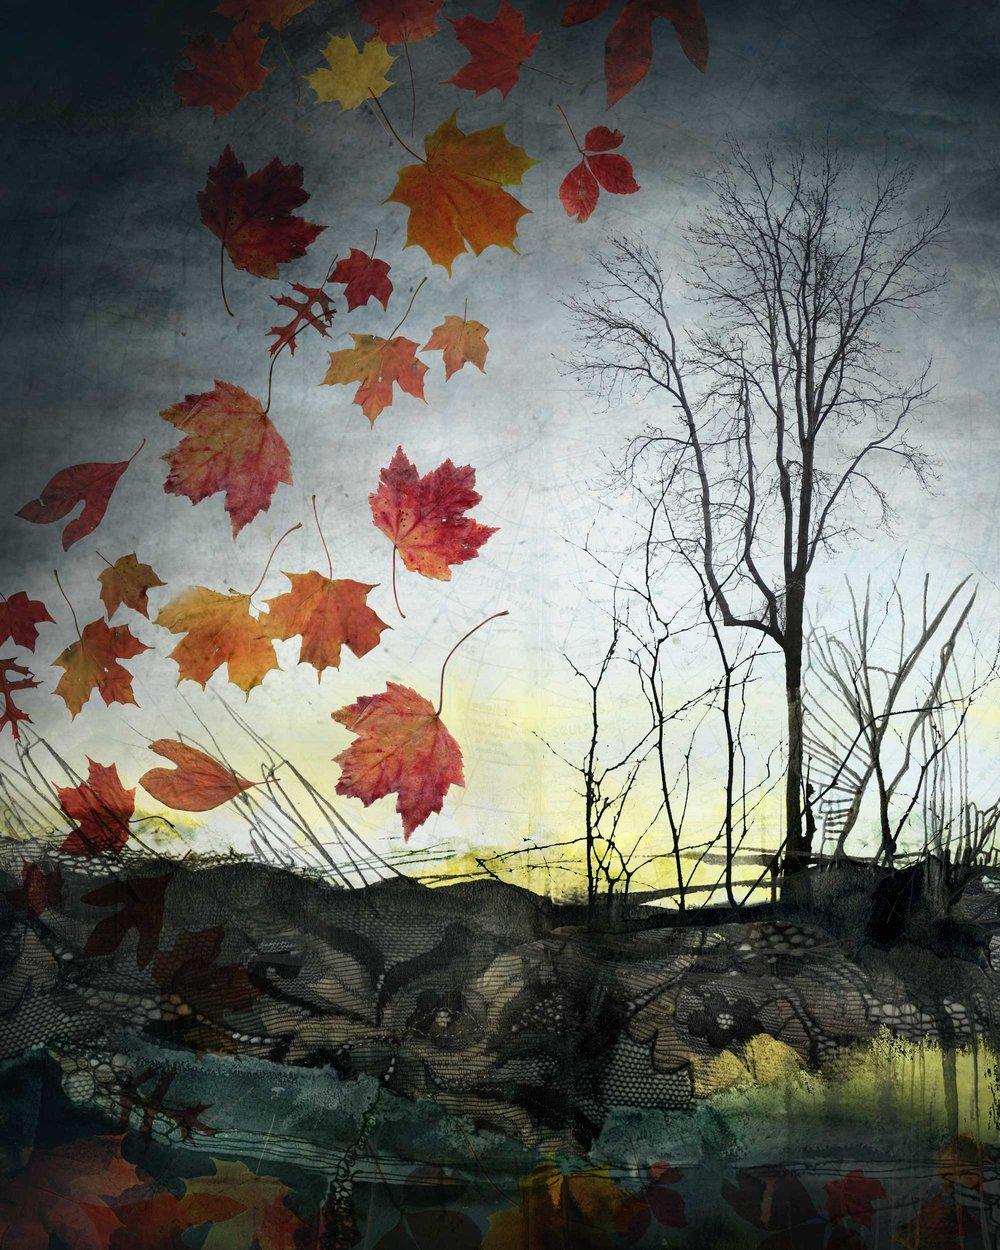 October (Falling)